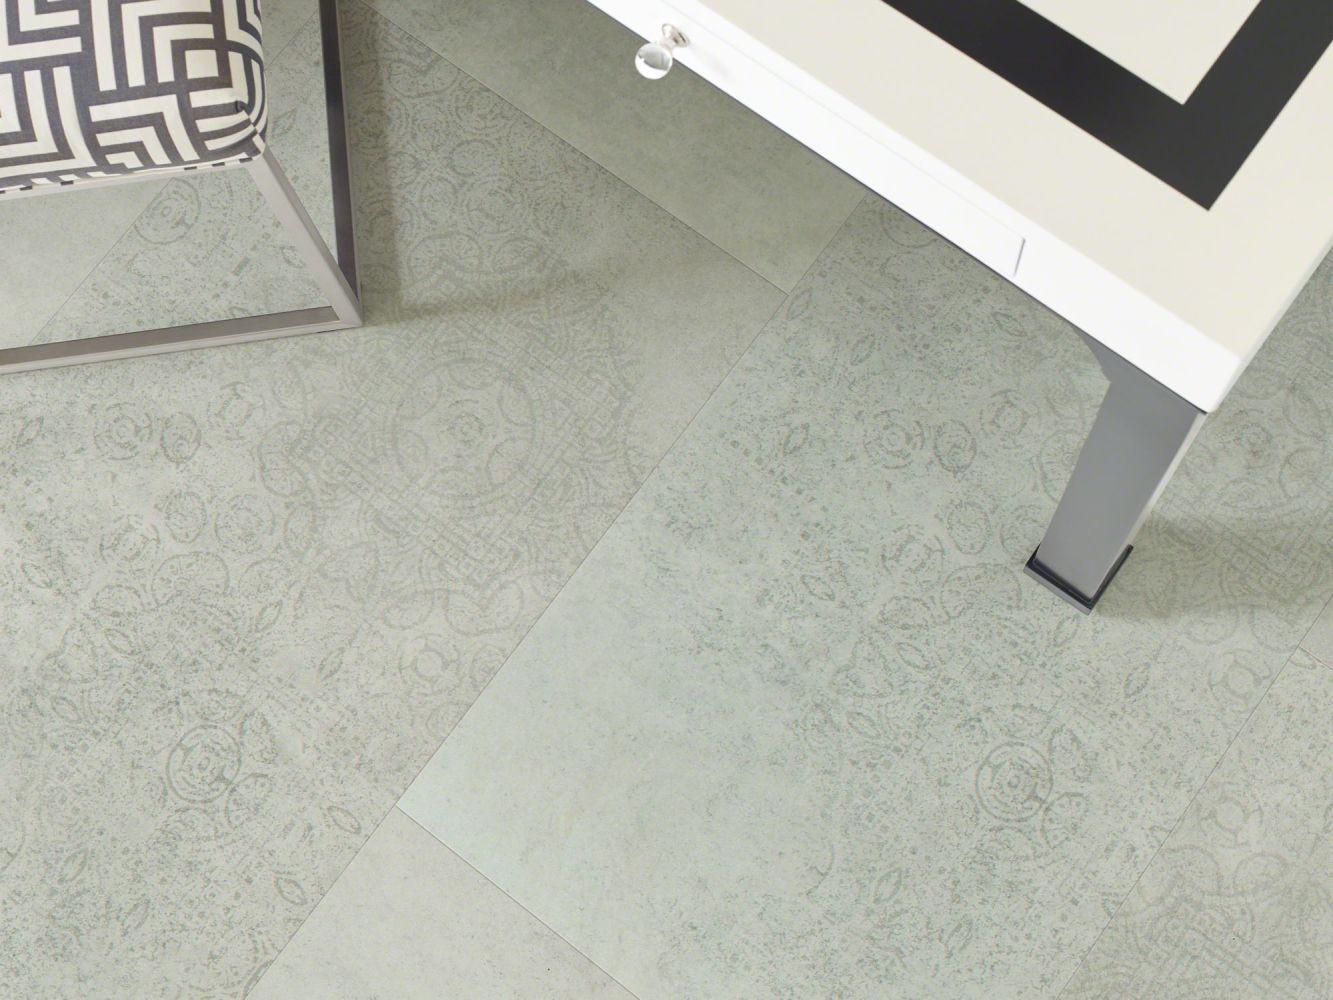 Shaw Floors Vinyl Home Foundations Turninstone 720c Plus Cascade 00597_521RG